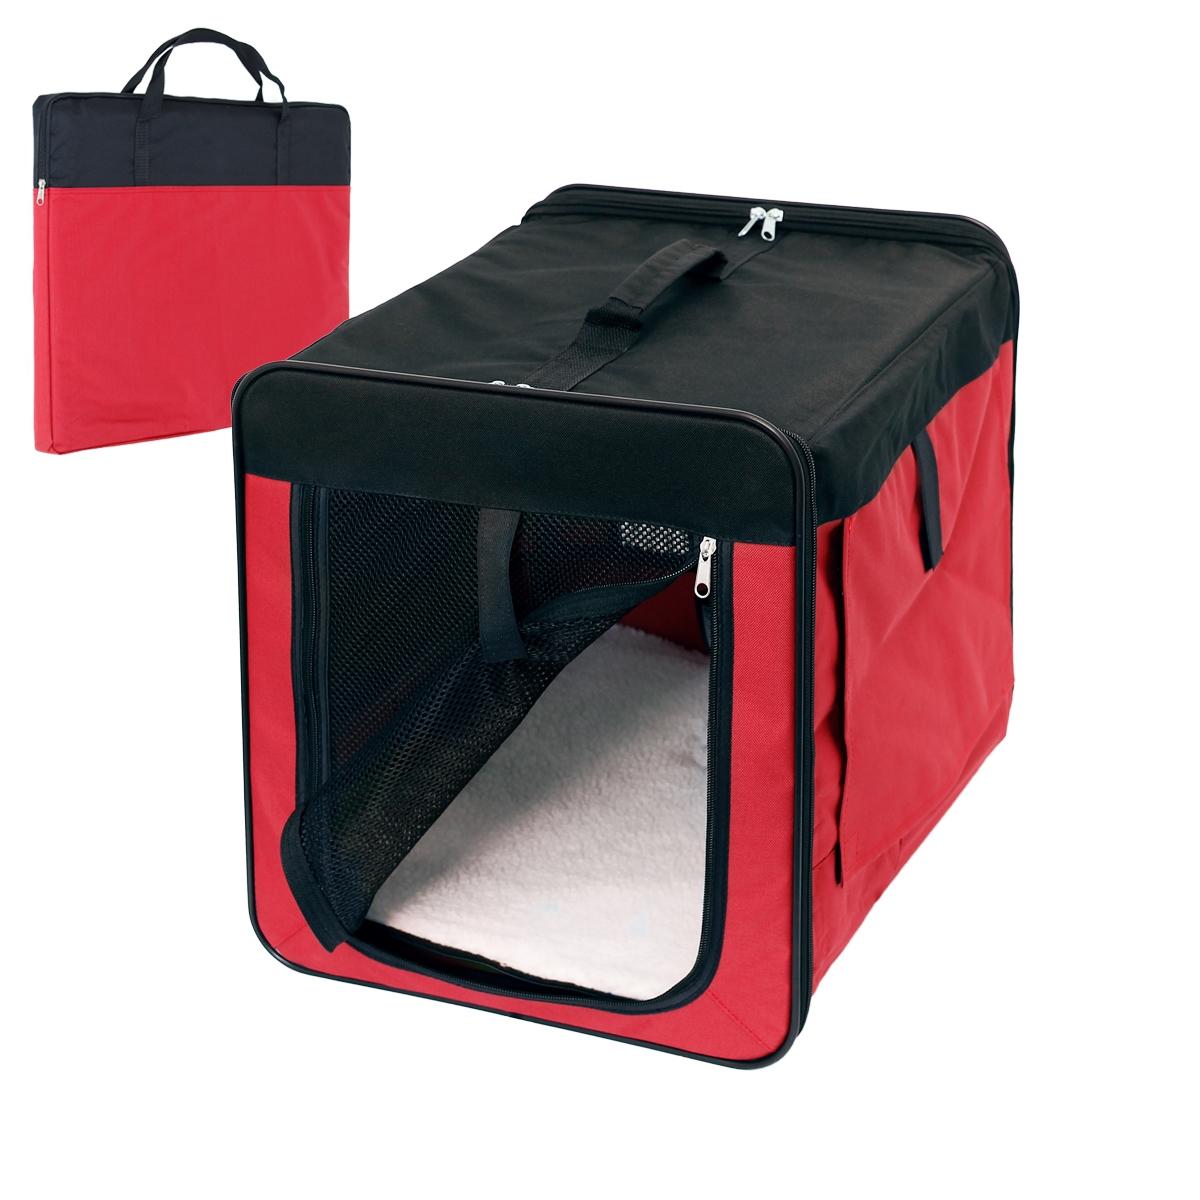 bo te transport pliable cage chien chat flexible doux. Black Bedroom Furniture Sets. Home Design Ideas